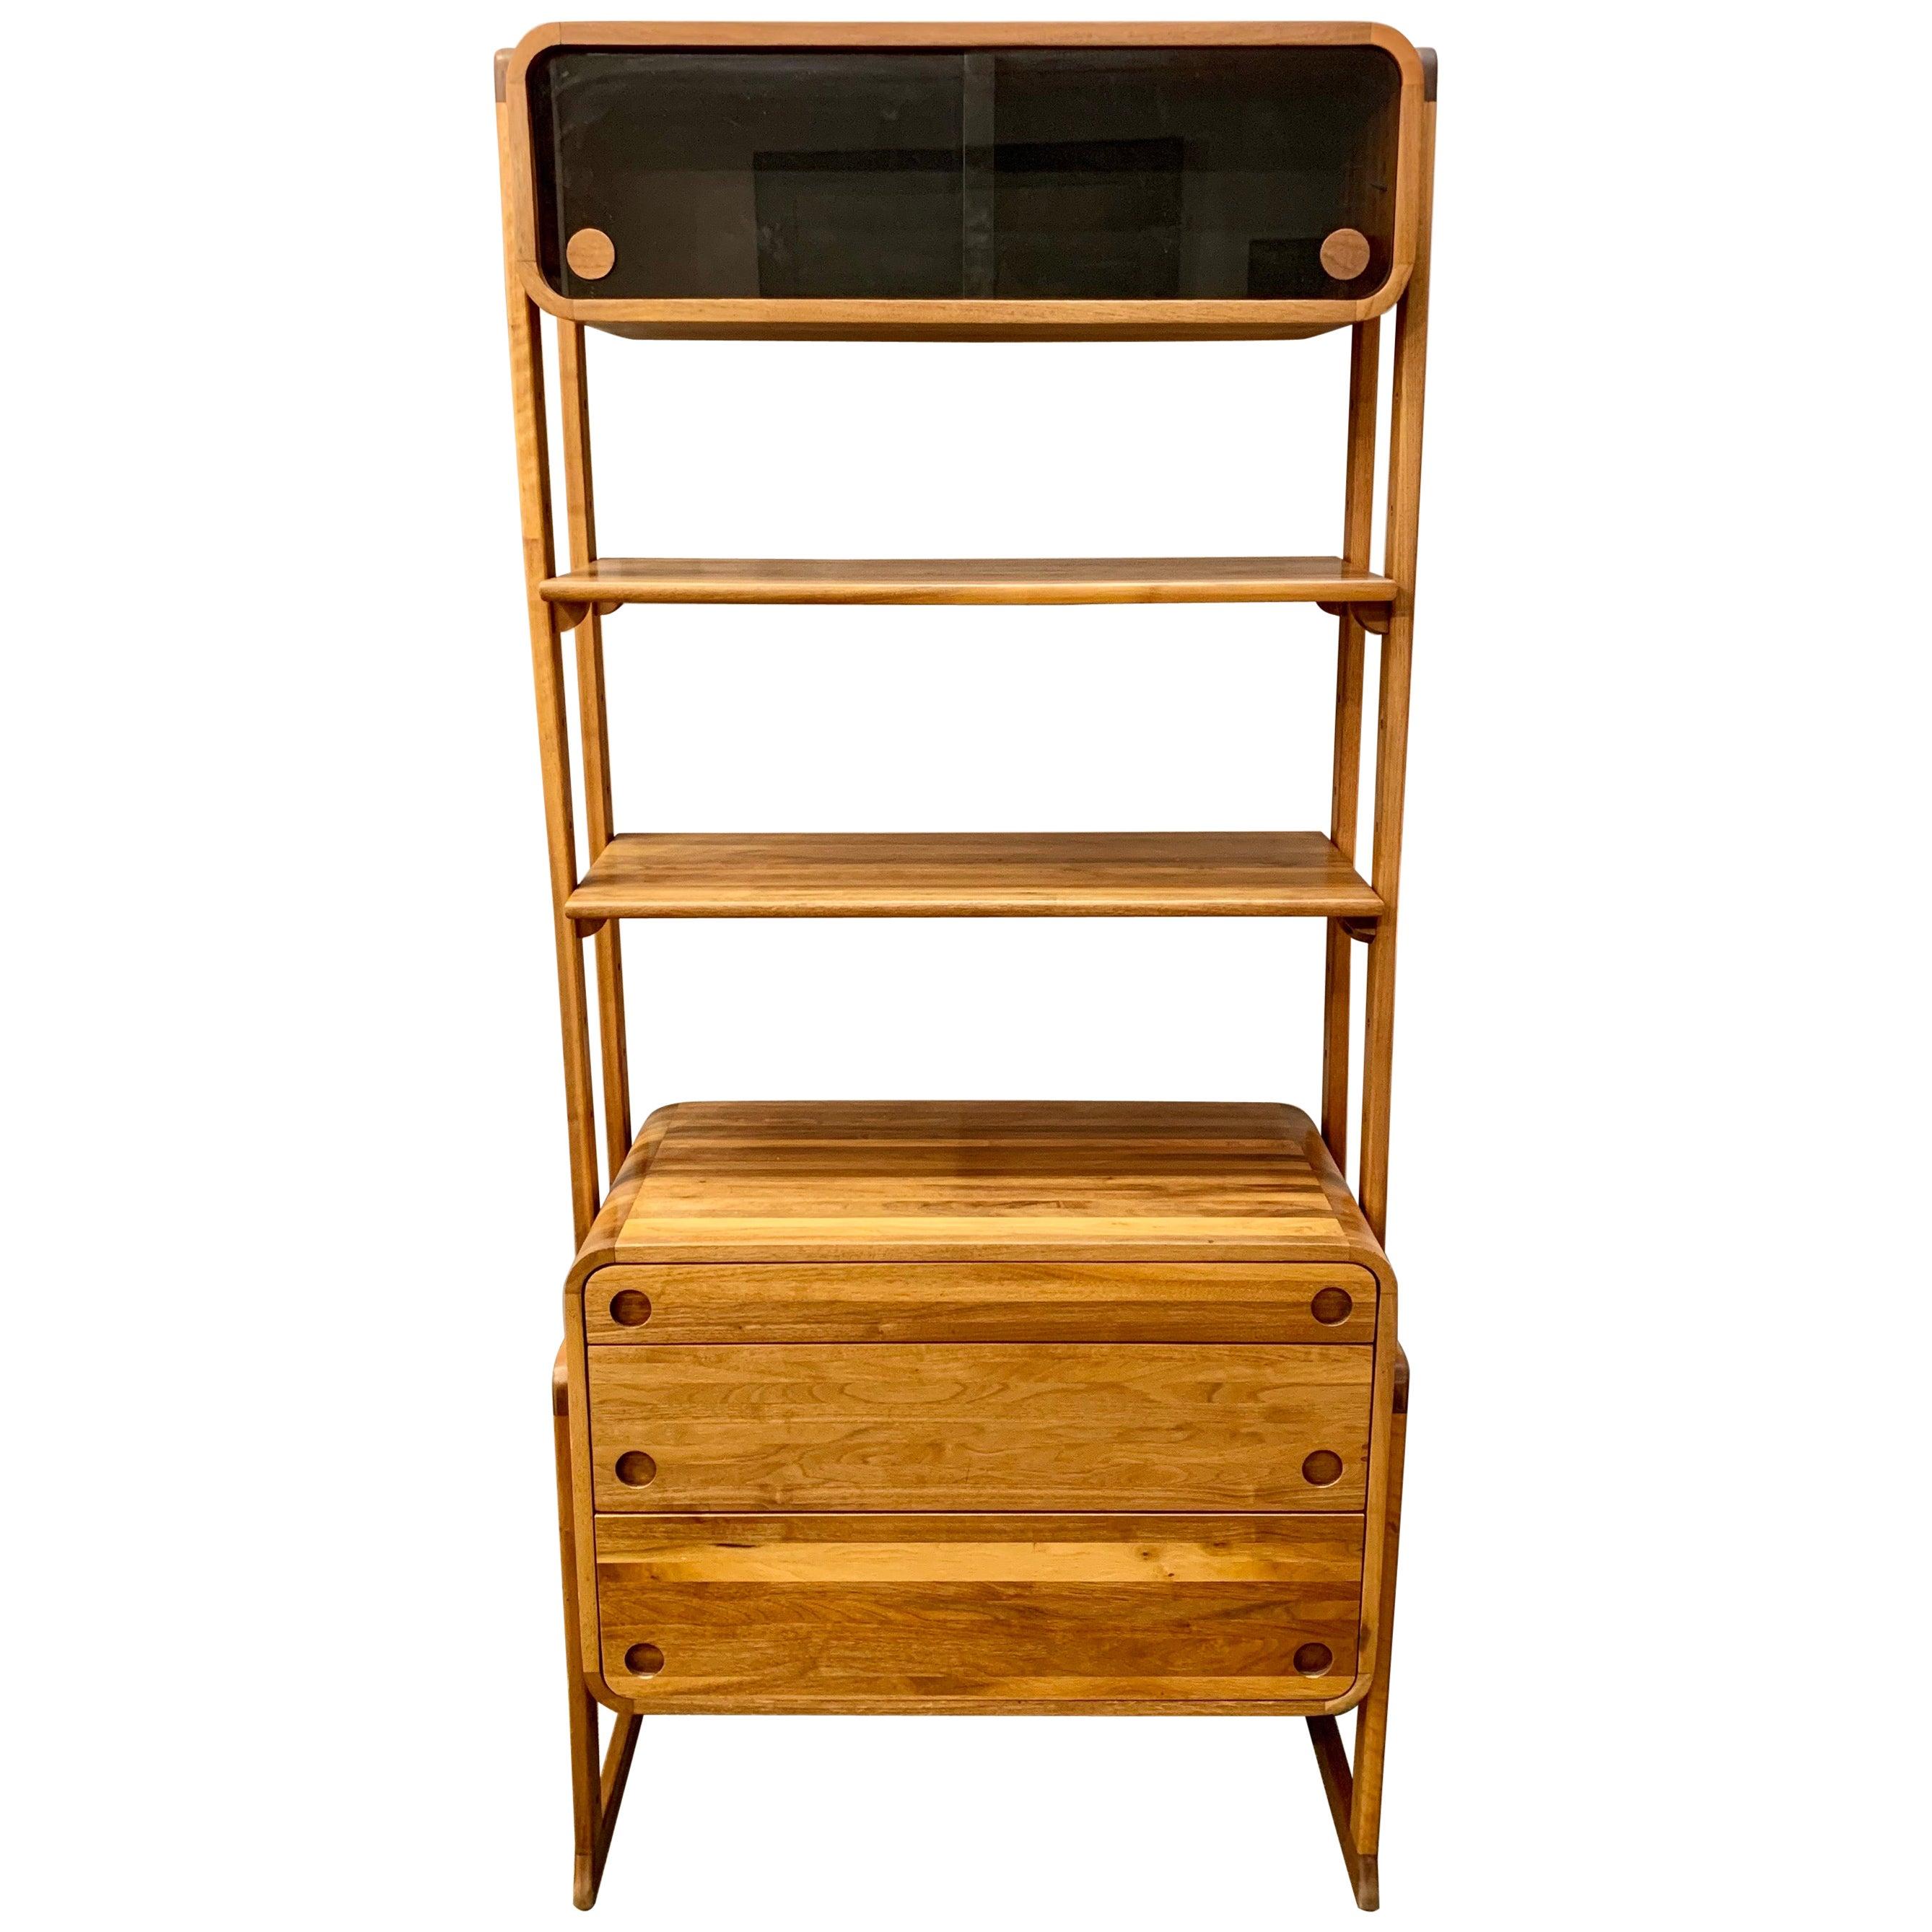 Danish Mid-Century Modern Étagère Bookshelf Cabinet Credenza